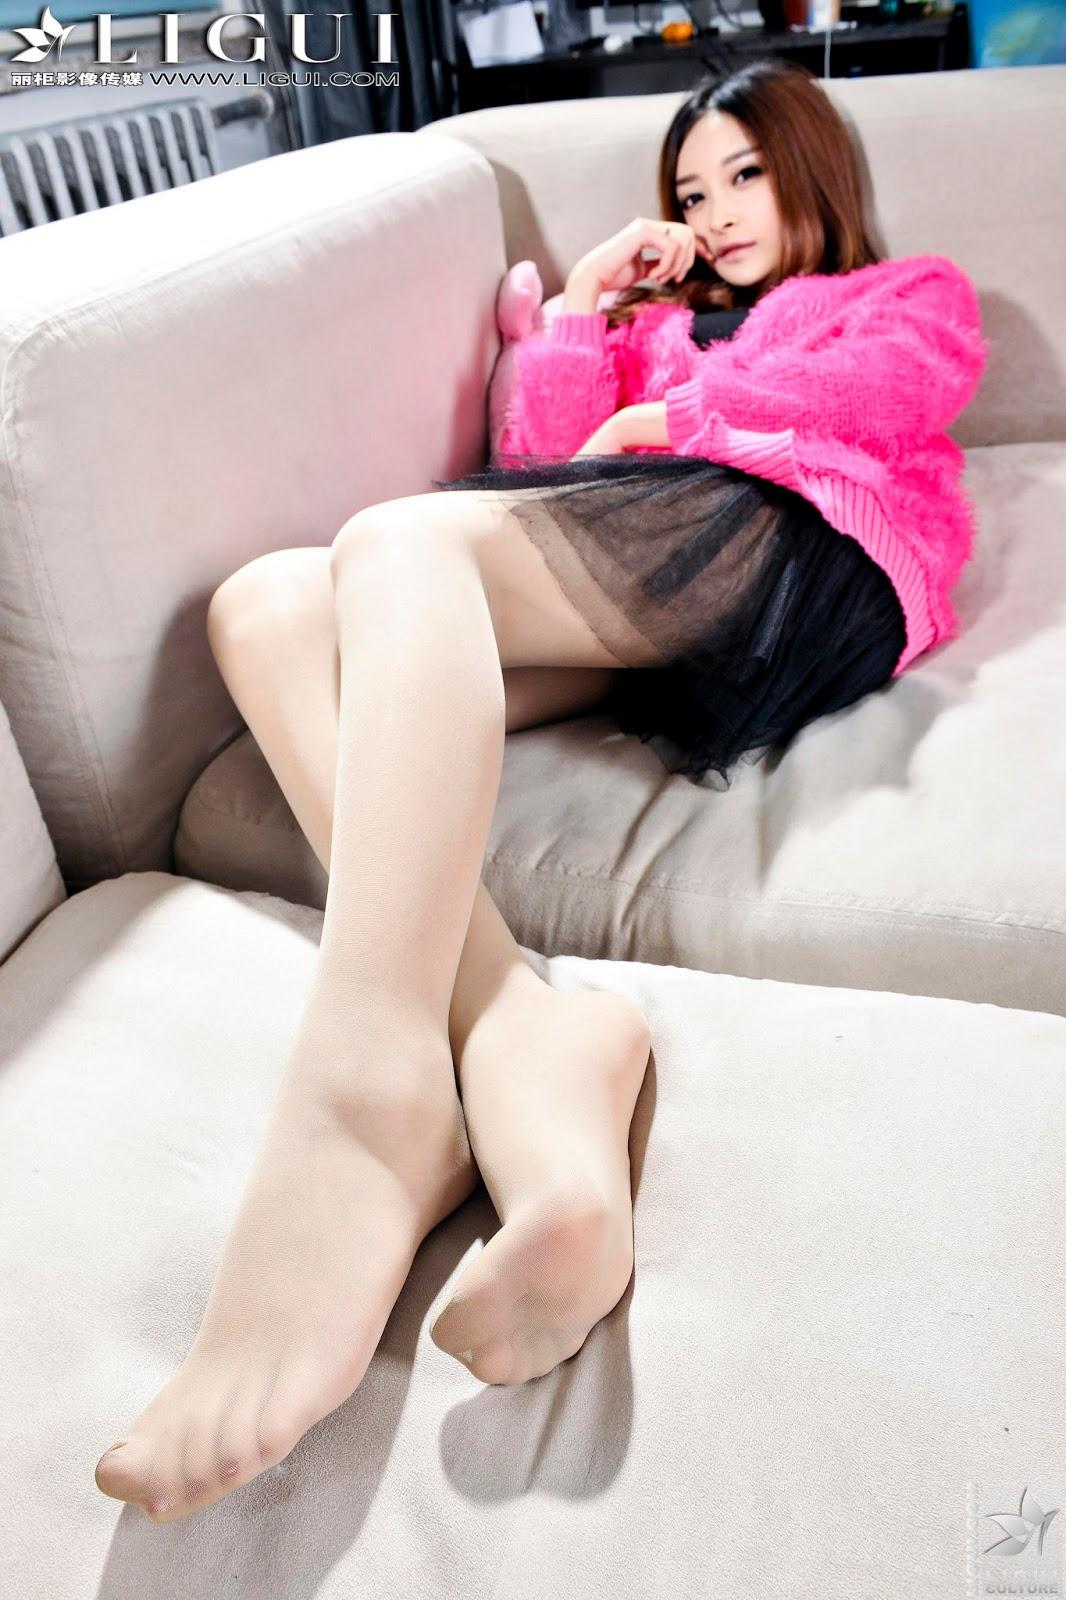 ligui pantyhose pictures nude gallery